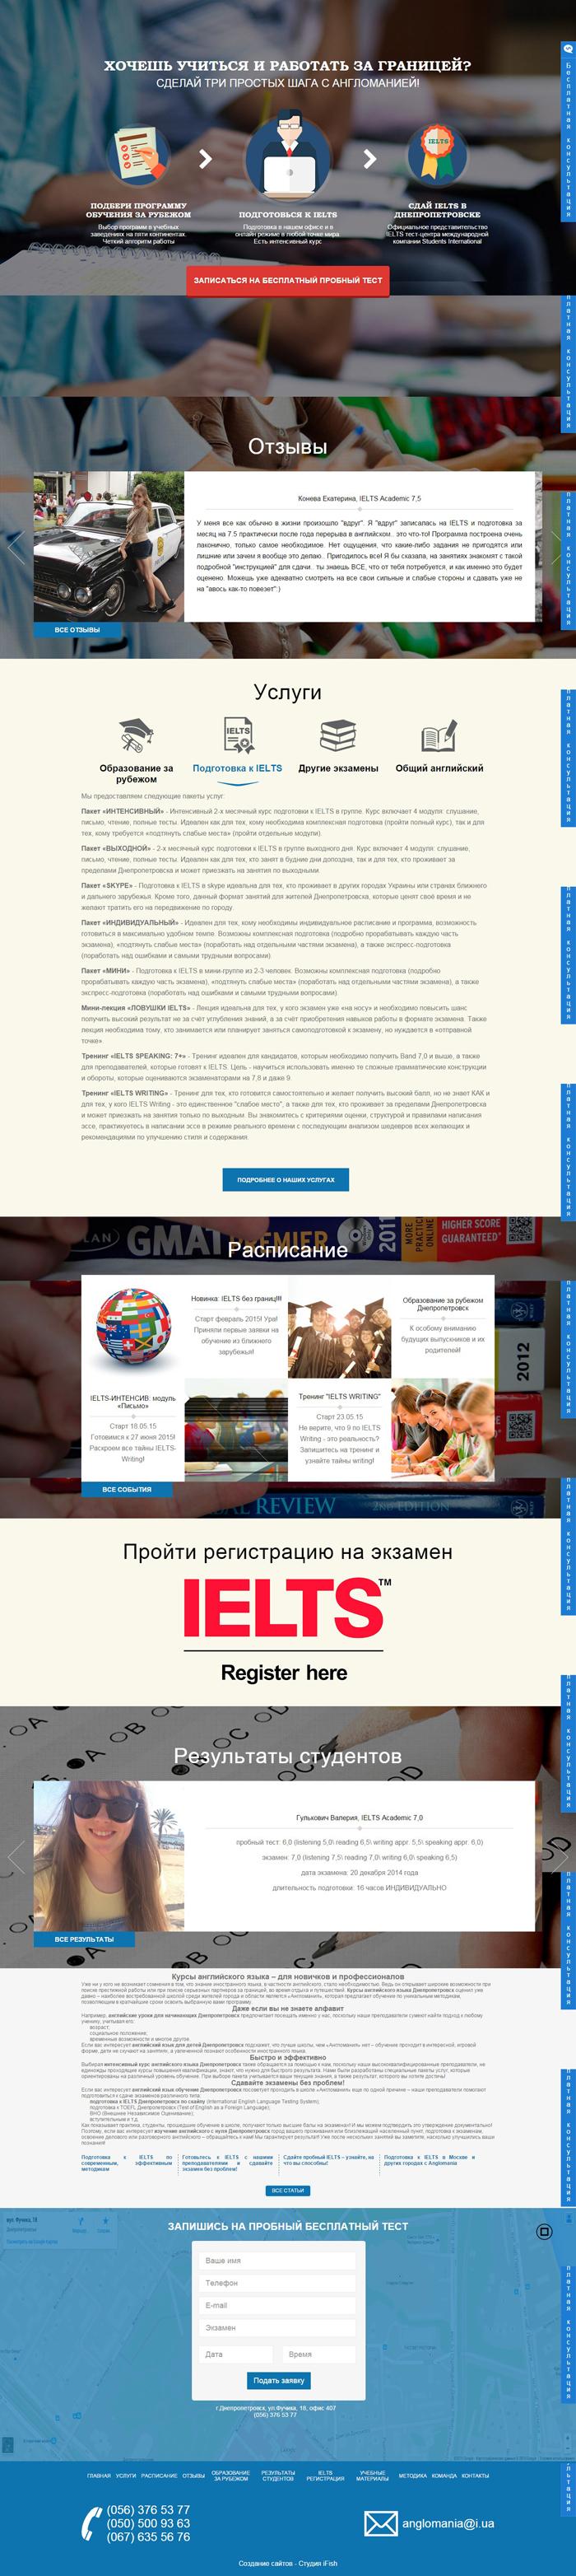 Школа английскиого в Днепропетровске